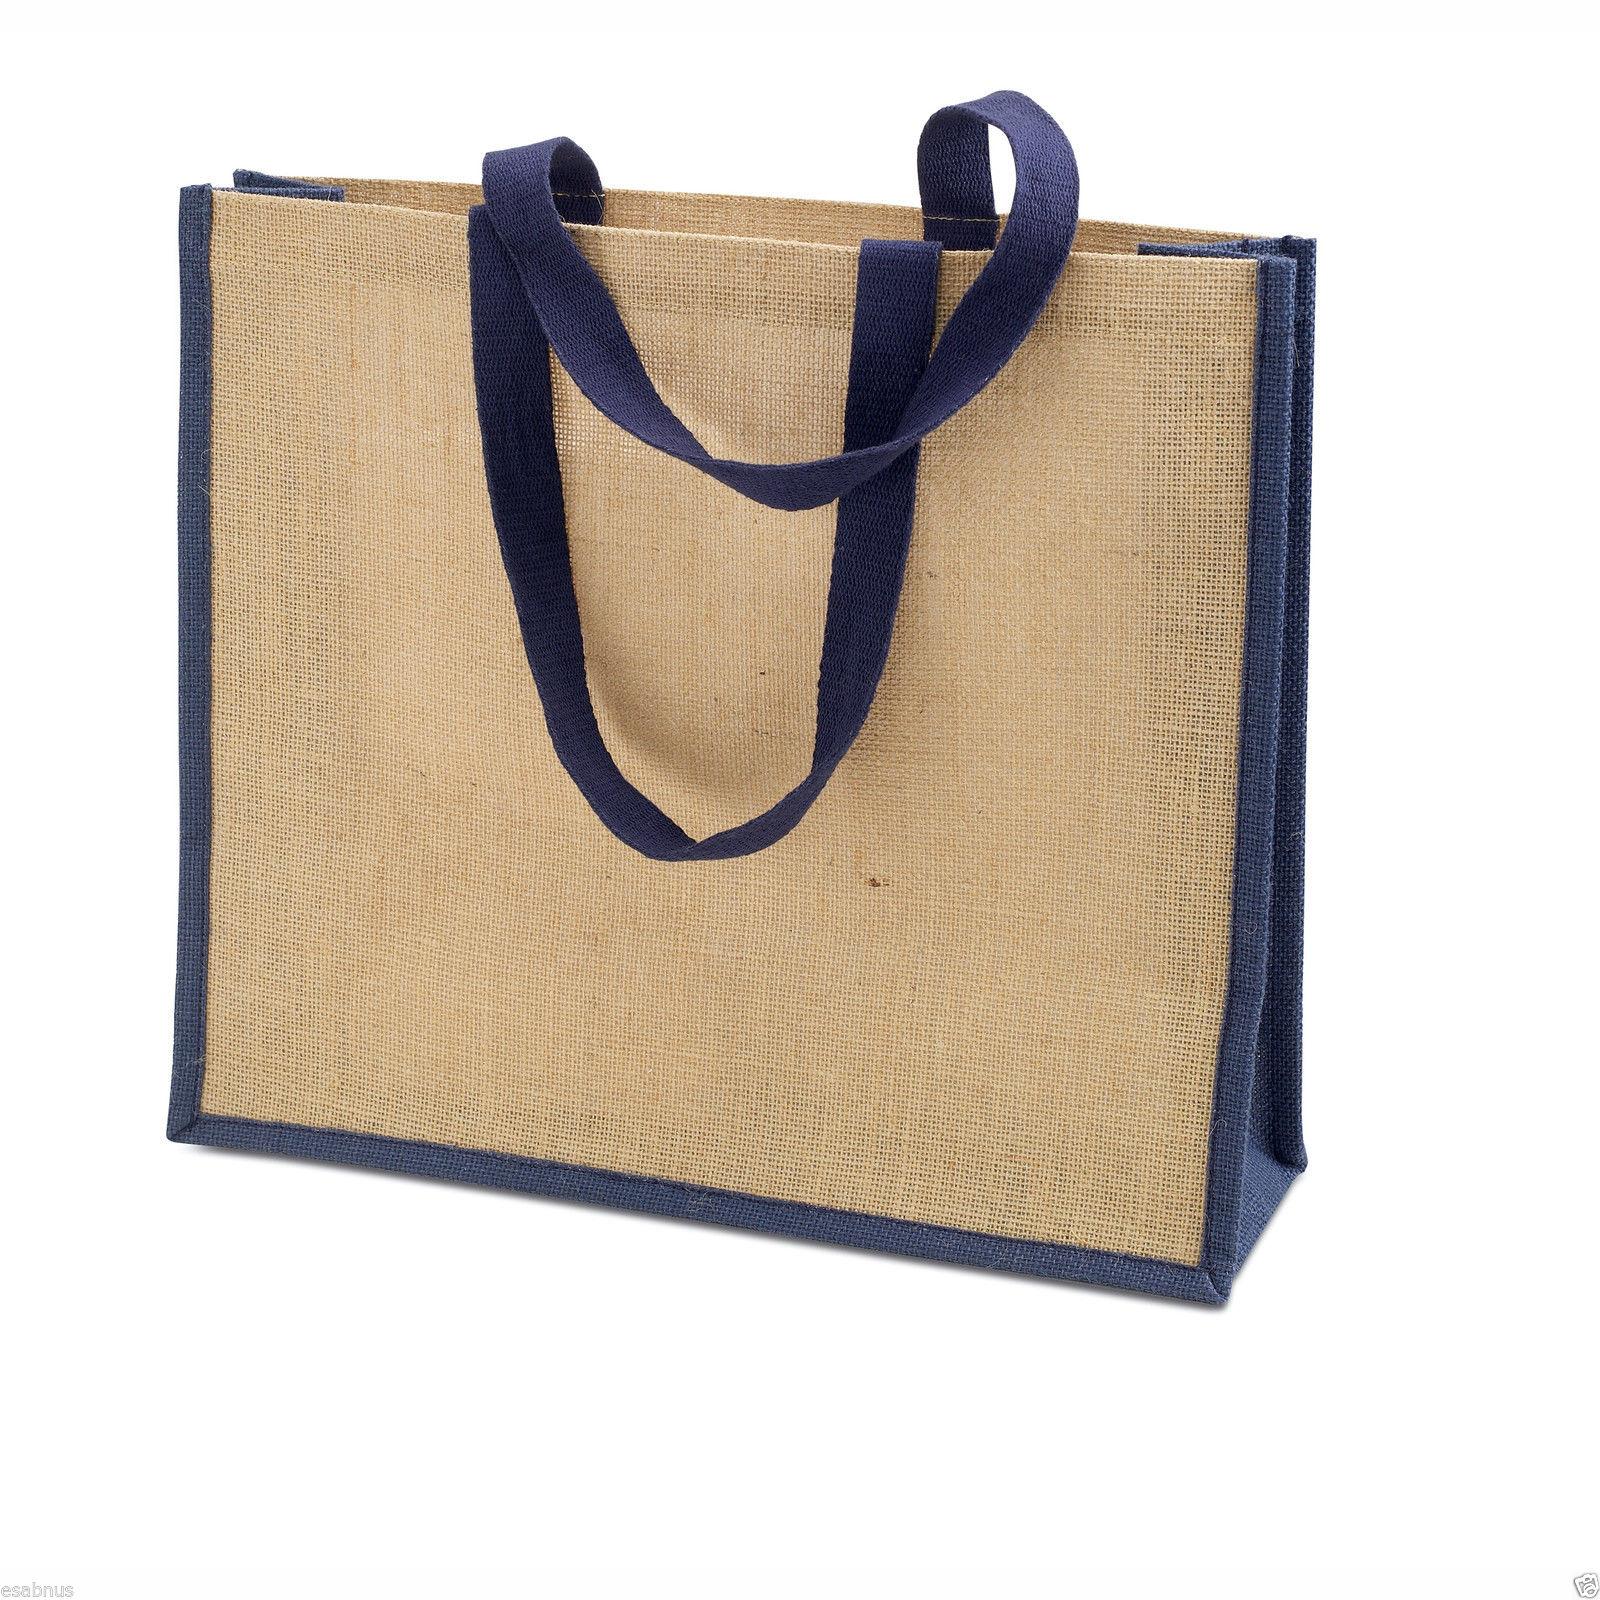 JUTE HESSIAN Shopping Bag–ECO FRIENDLY Shopper REUSABLE Grocery ...